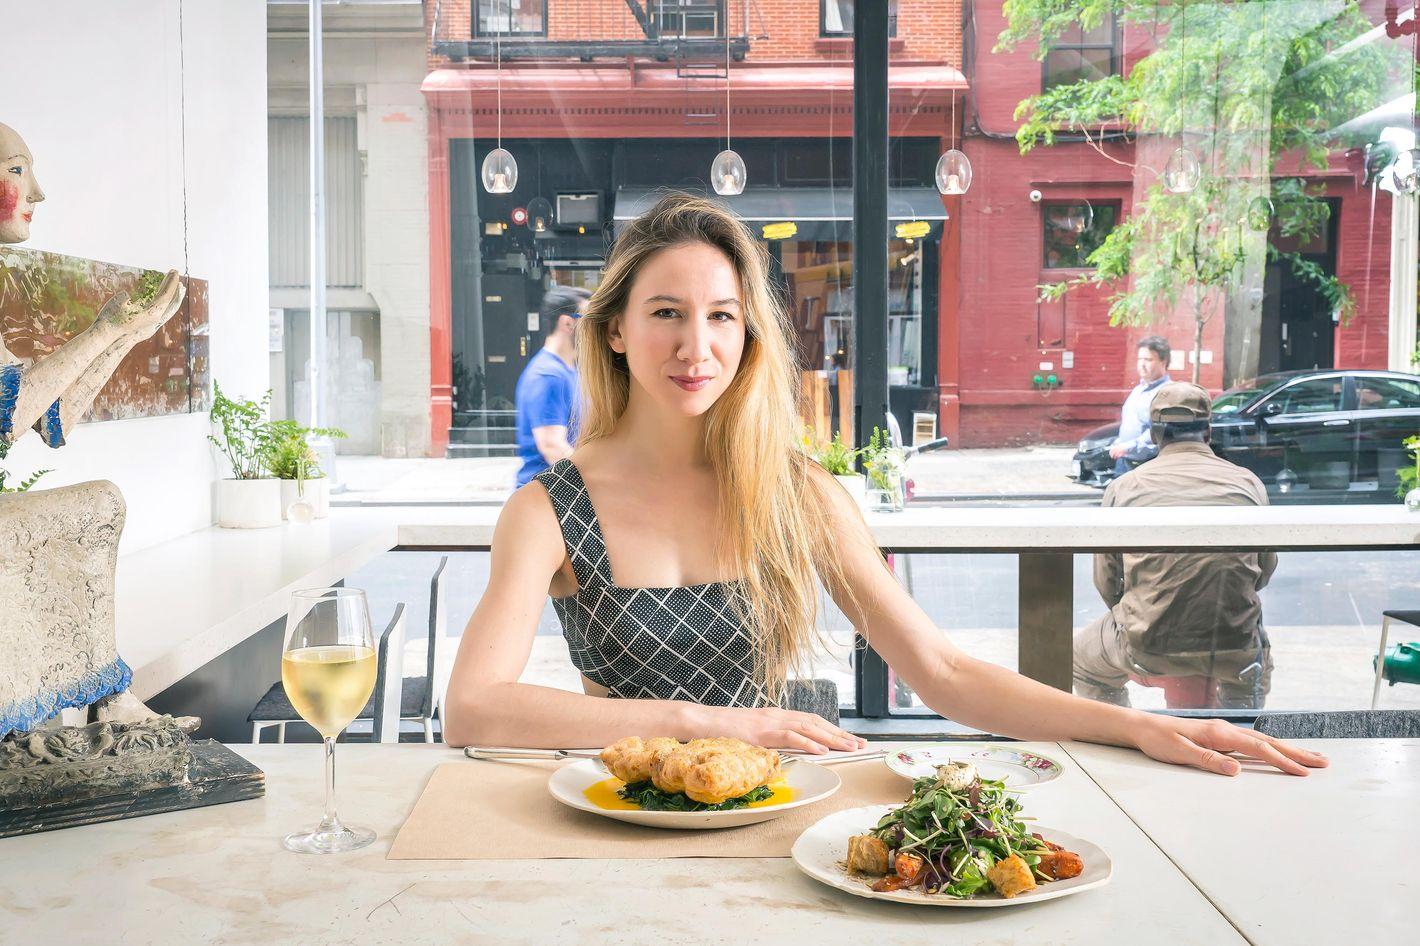 Pics Isabella Boylston nude (33 photos), Topless, Paparazzi, Instagram, panties 2019